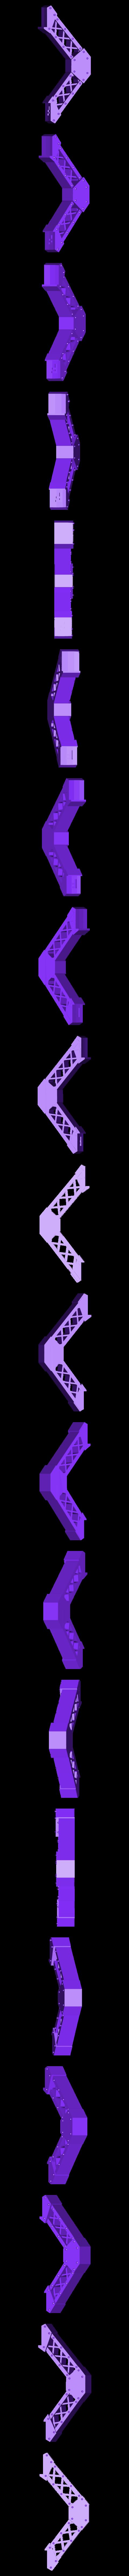 platform_arm.stl Download free STL file Gowanus Monster - Margo Series • 3D printable object, boldmachines